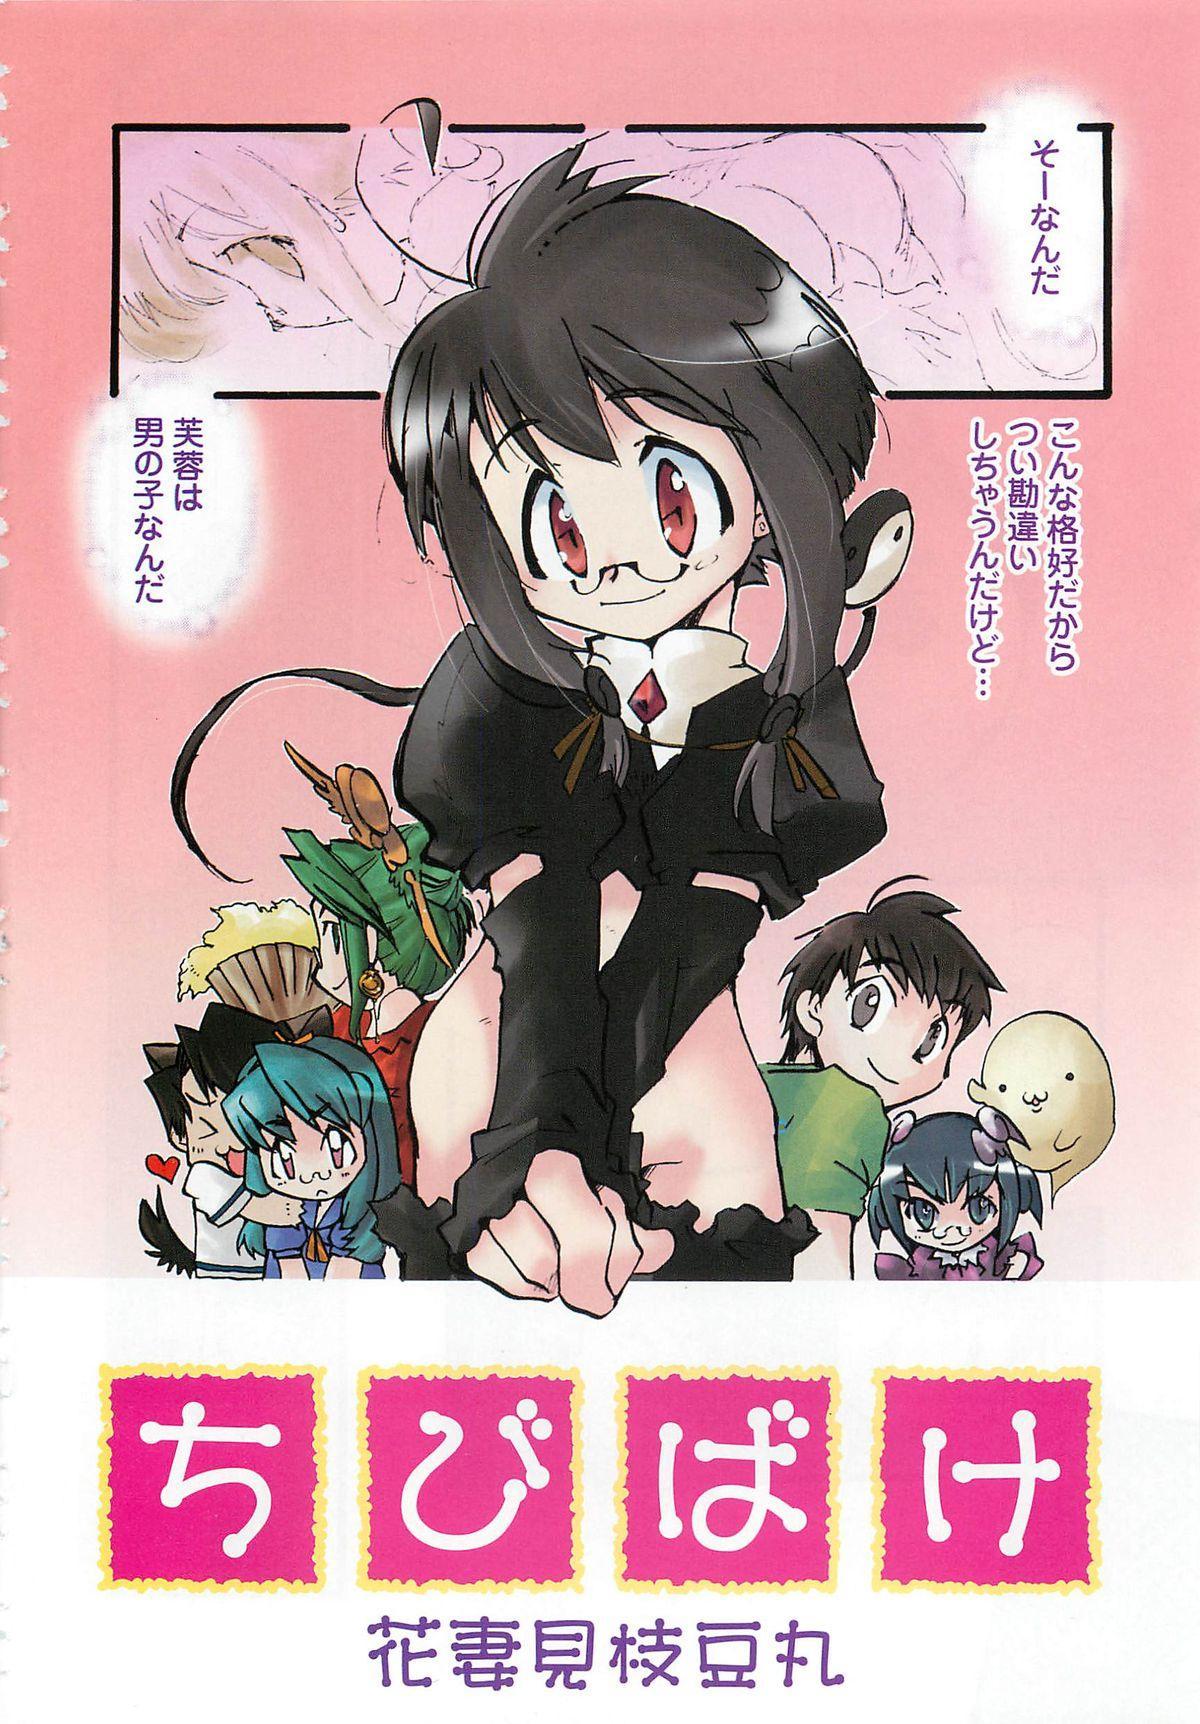 Otokonoko HEAVEN Vol. 02 Dokidoki Chikan Taiken 6